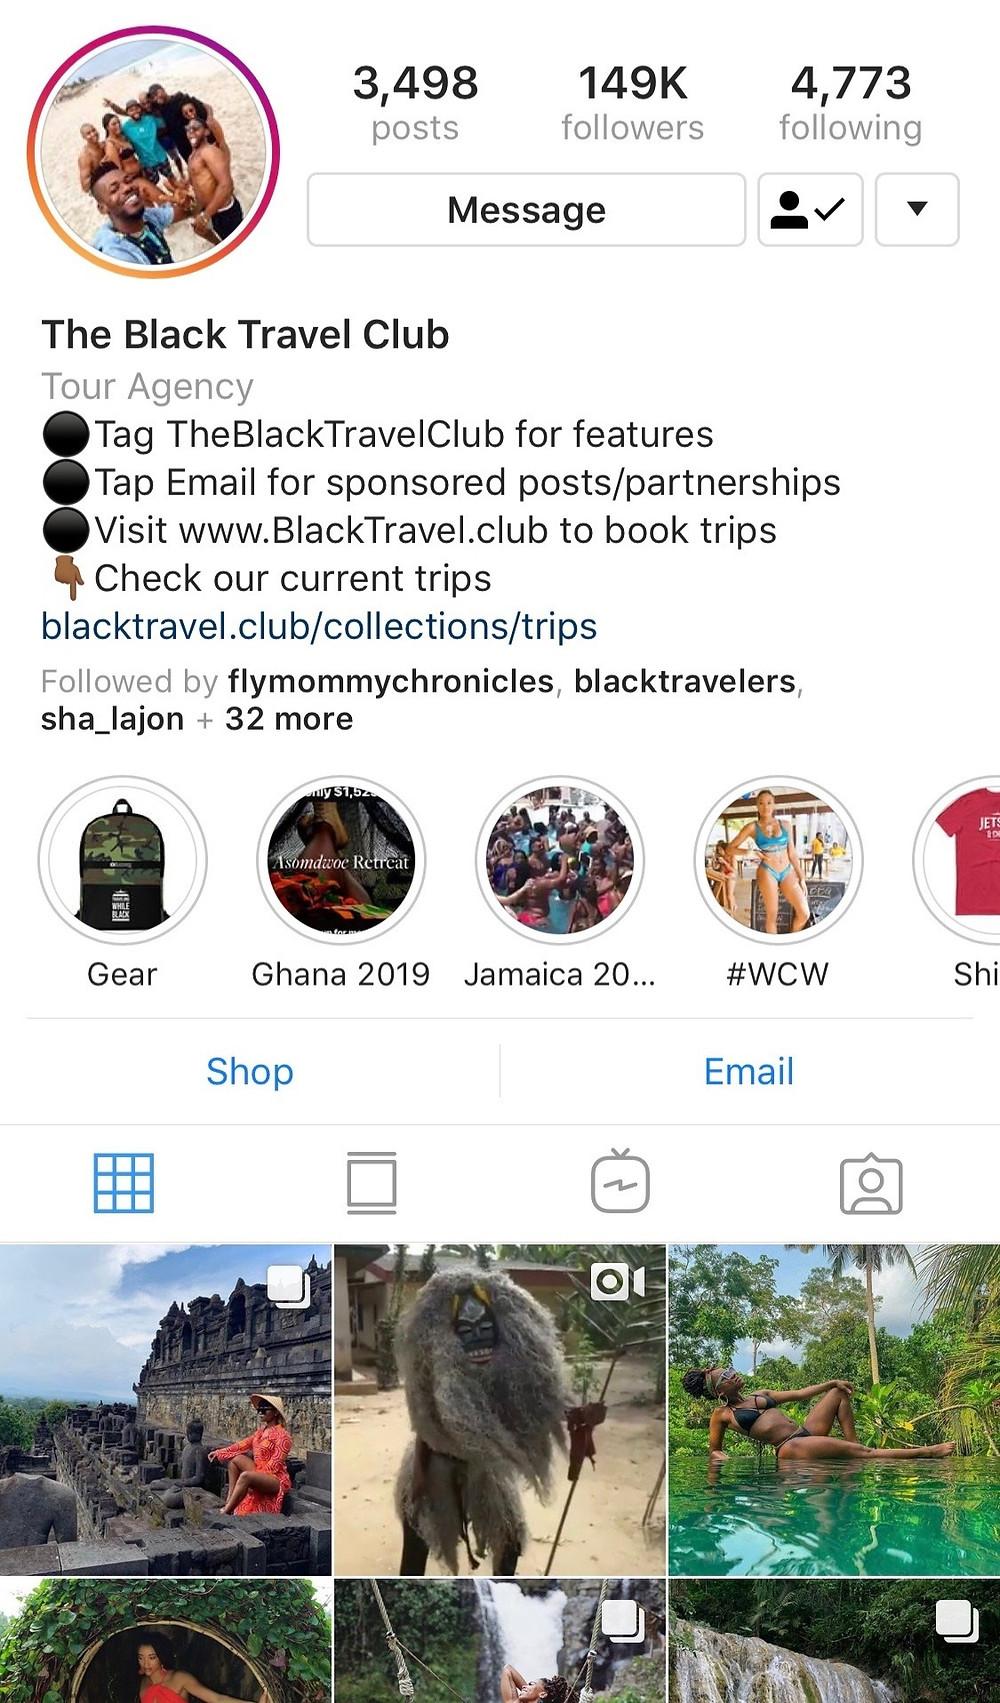 coupes travel, romance, anniversary, beach, flamingos, couples travel blog, married couples blog, black travel bloggers, travel vlog